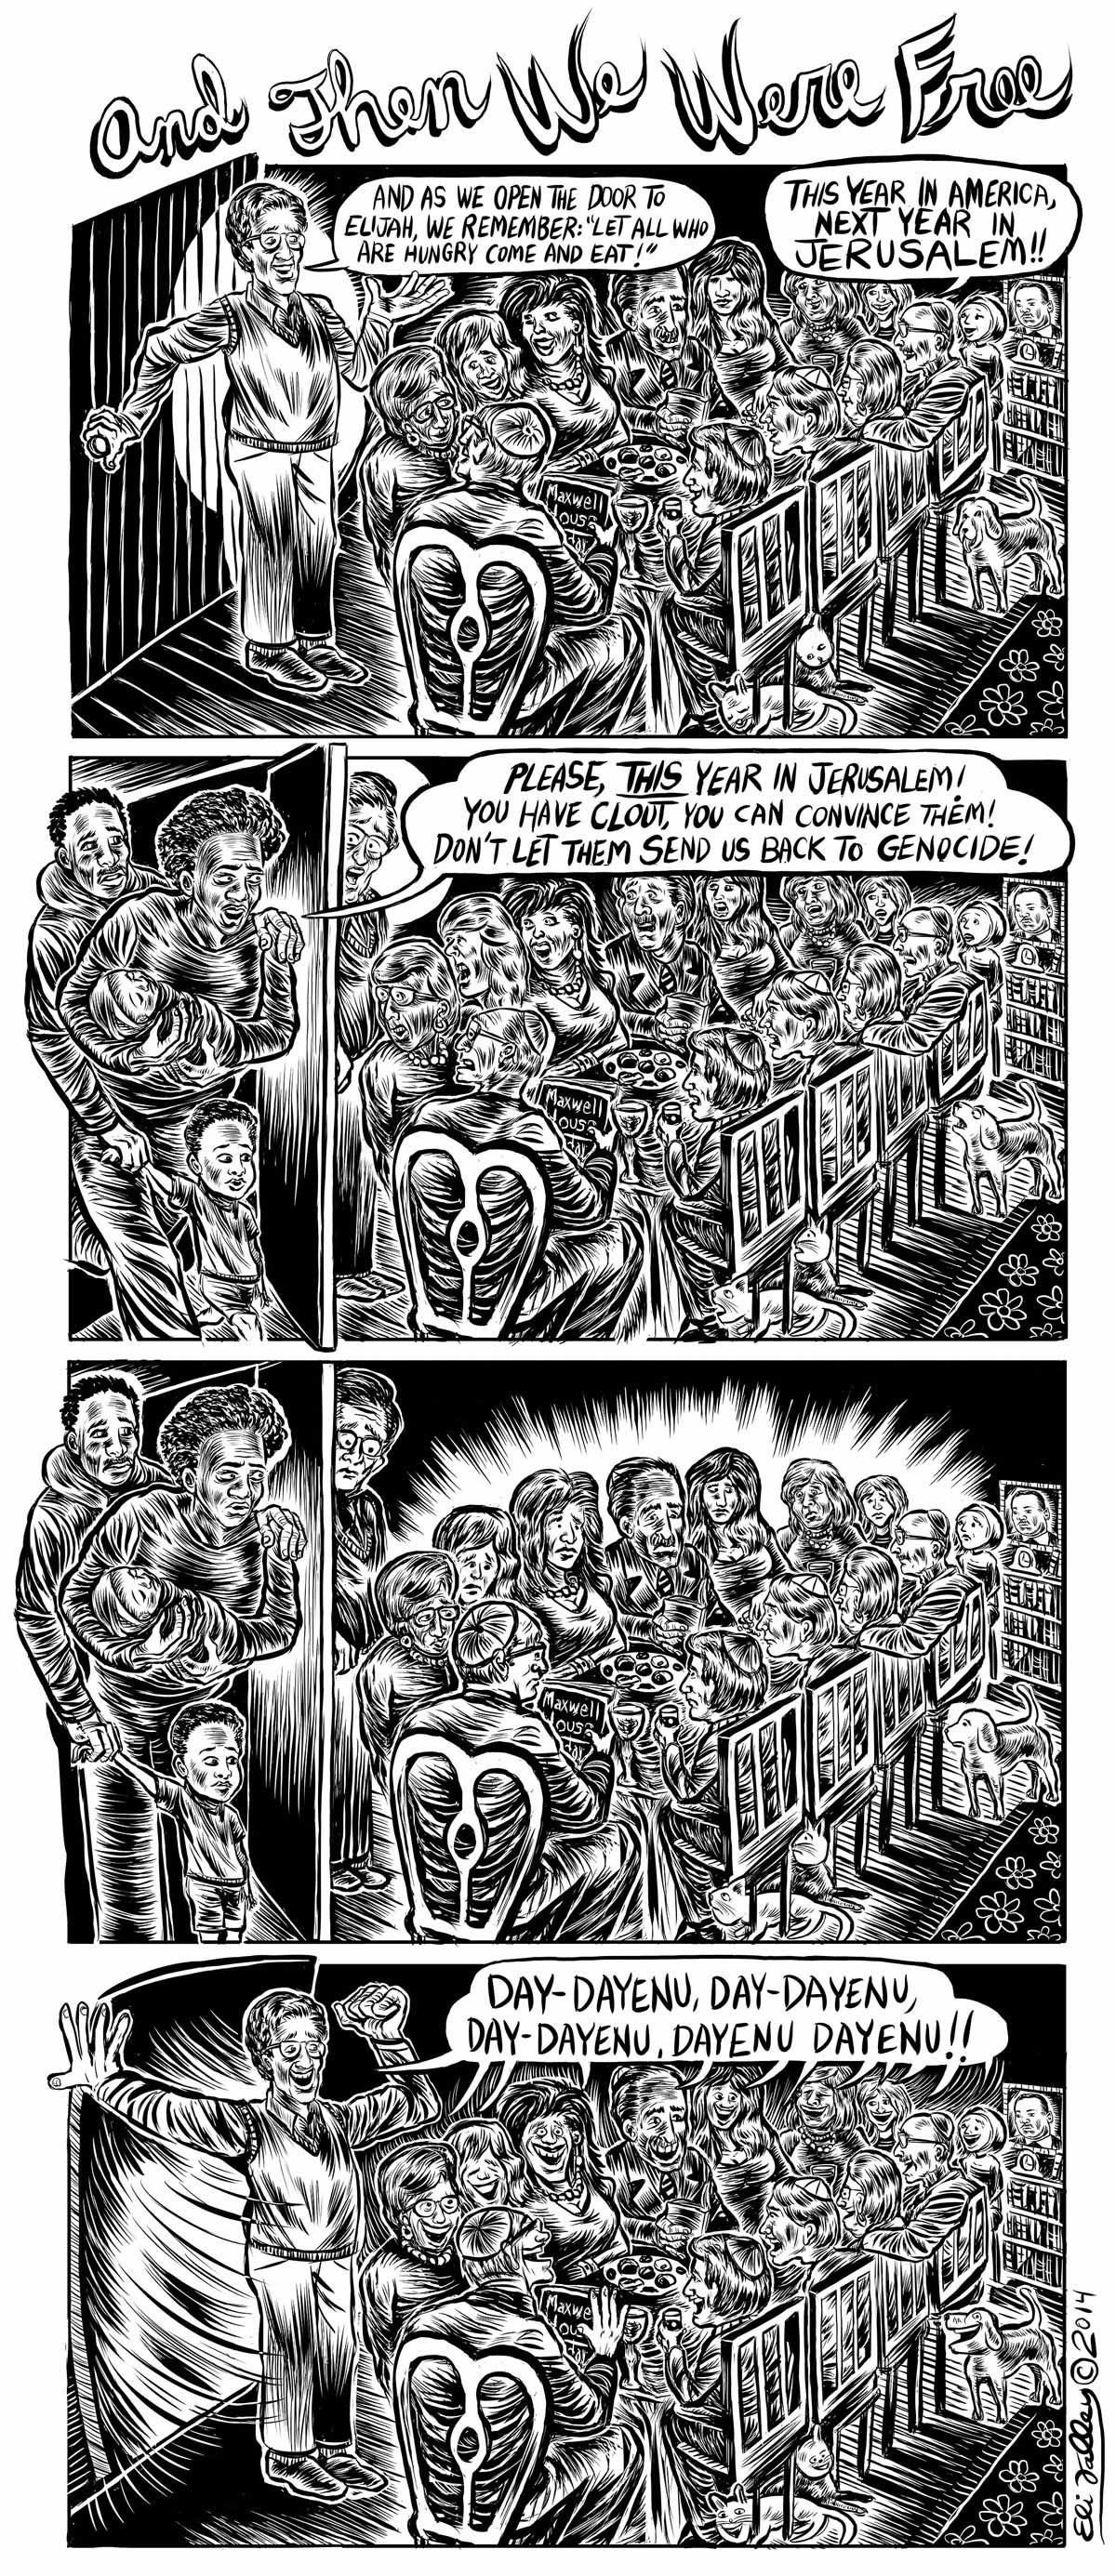 Eli Valley Passover cartoon (page 2)